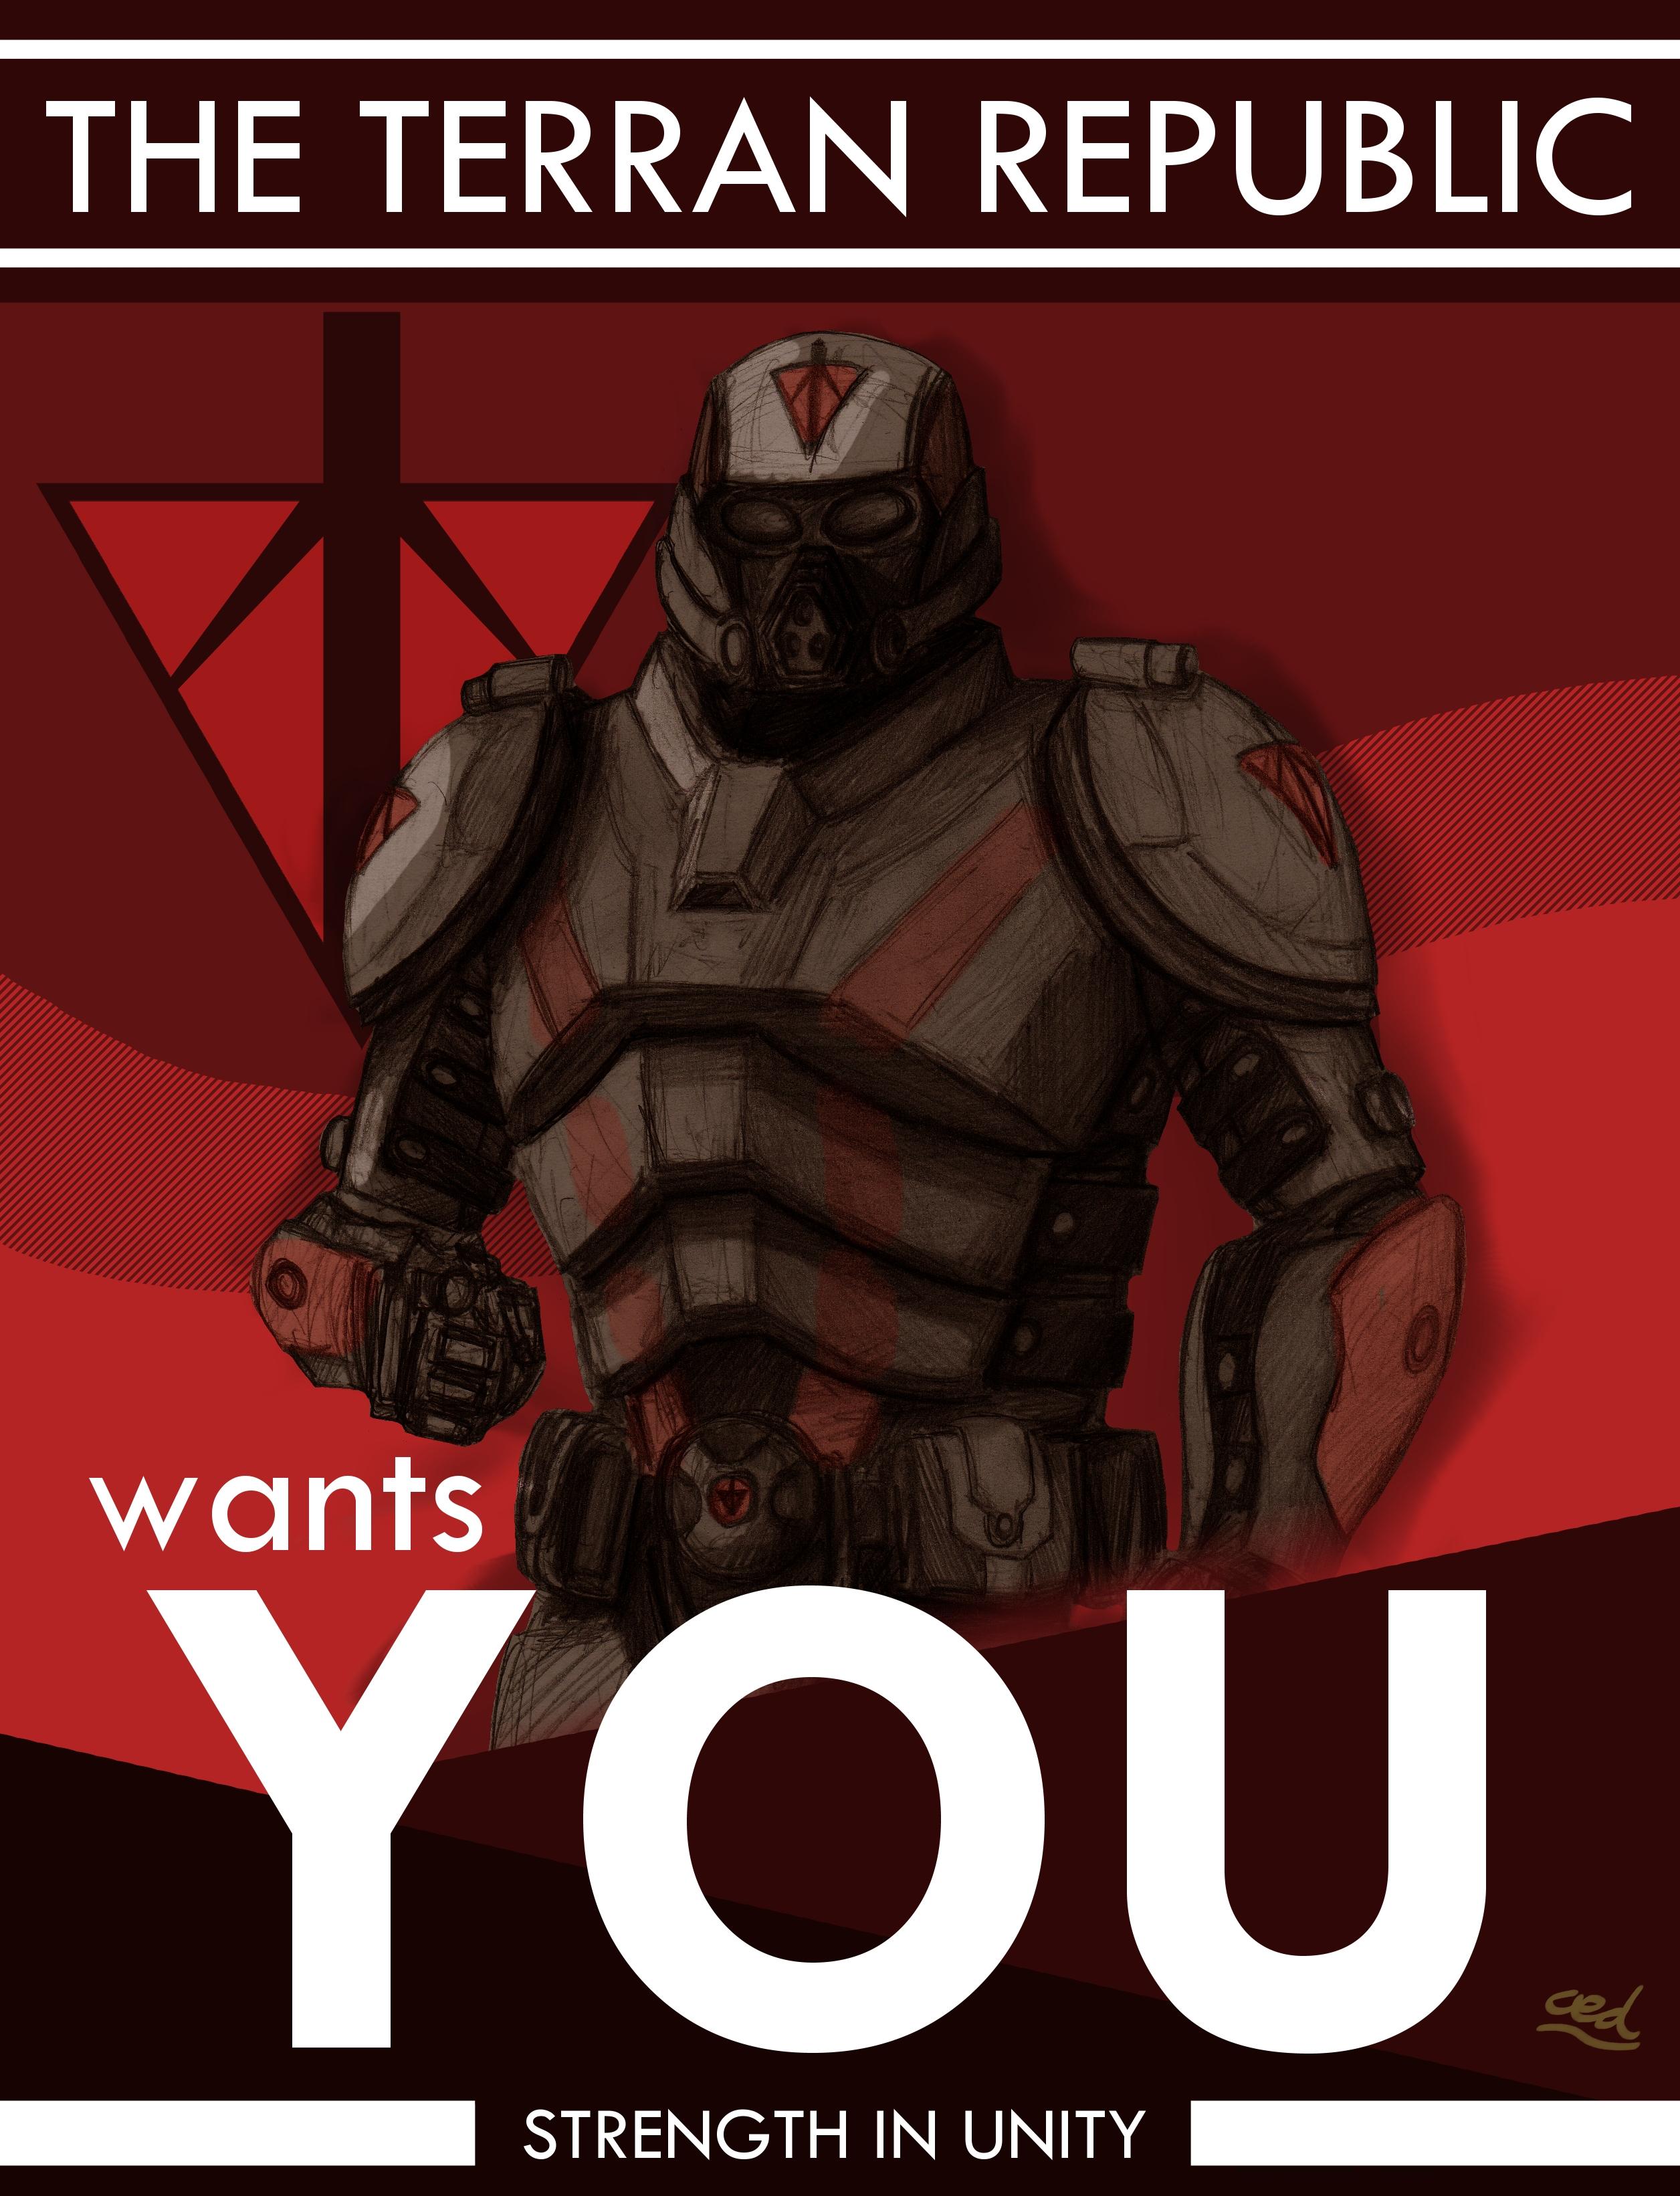 terran_republic_recruitment_by_misterkha